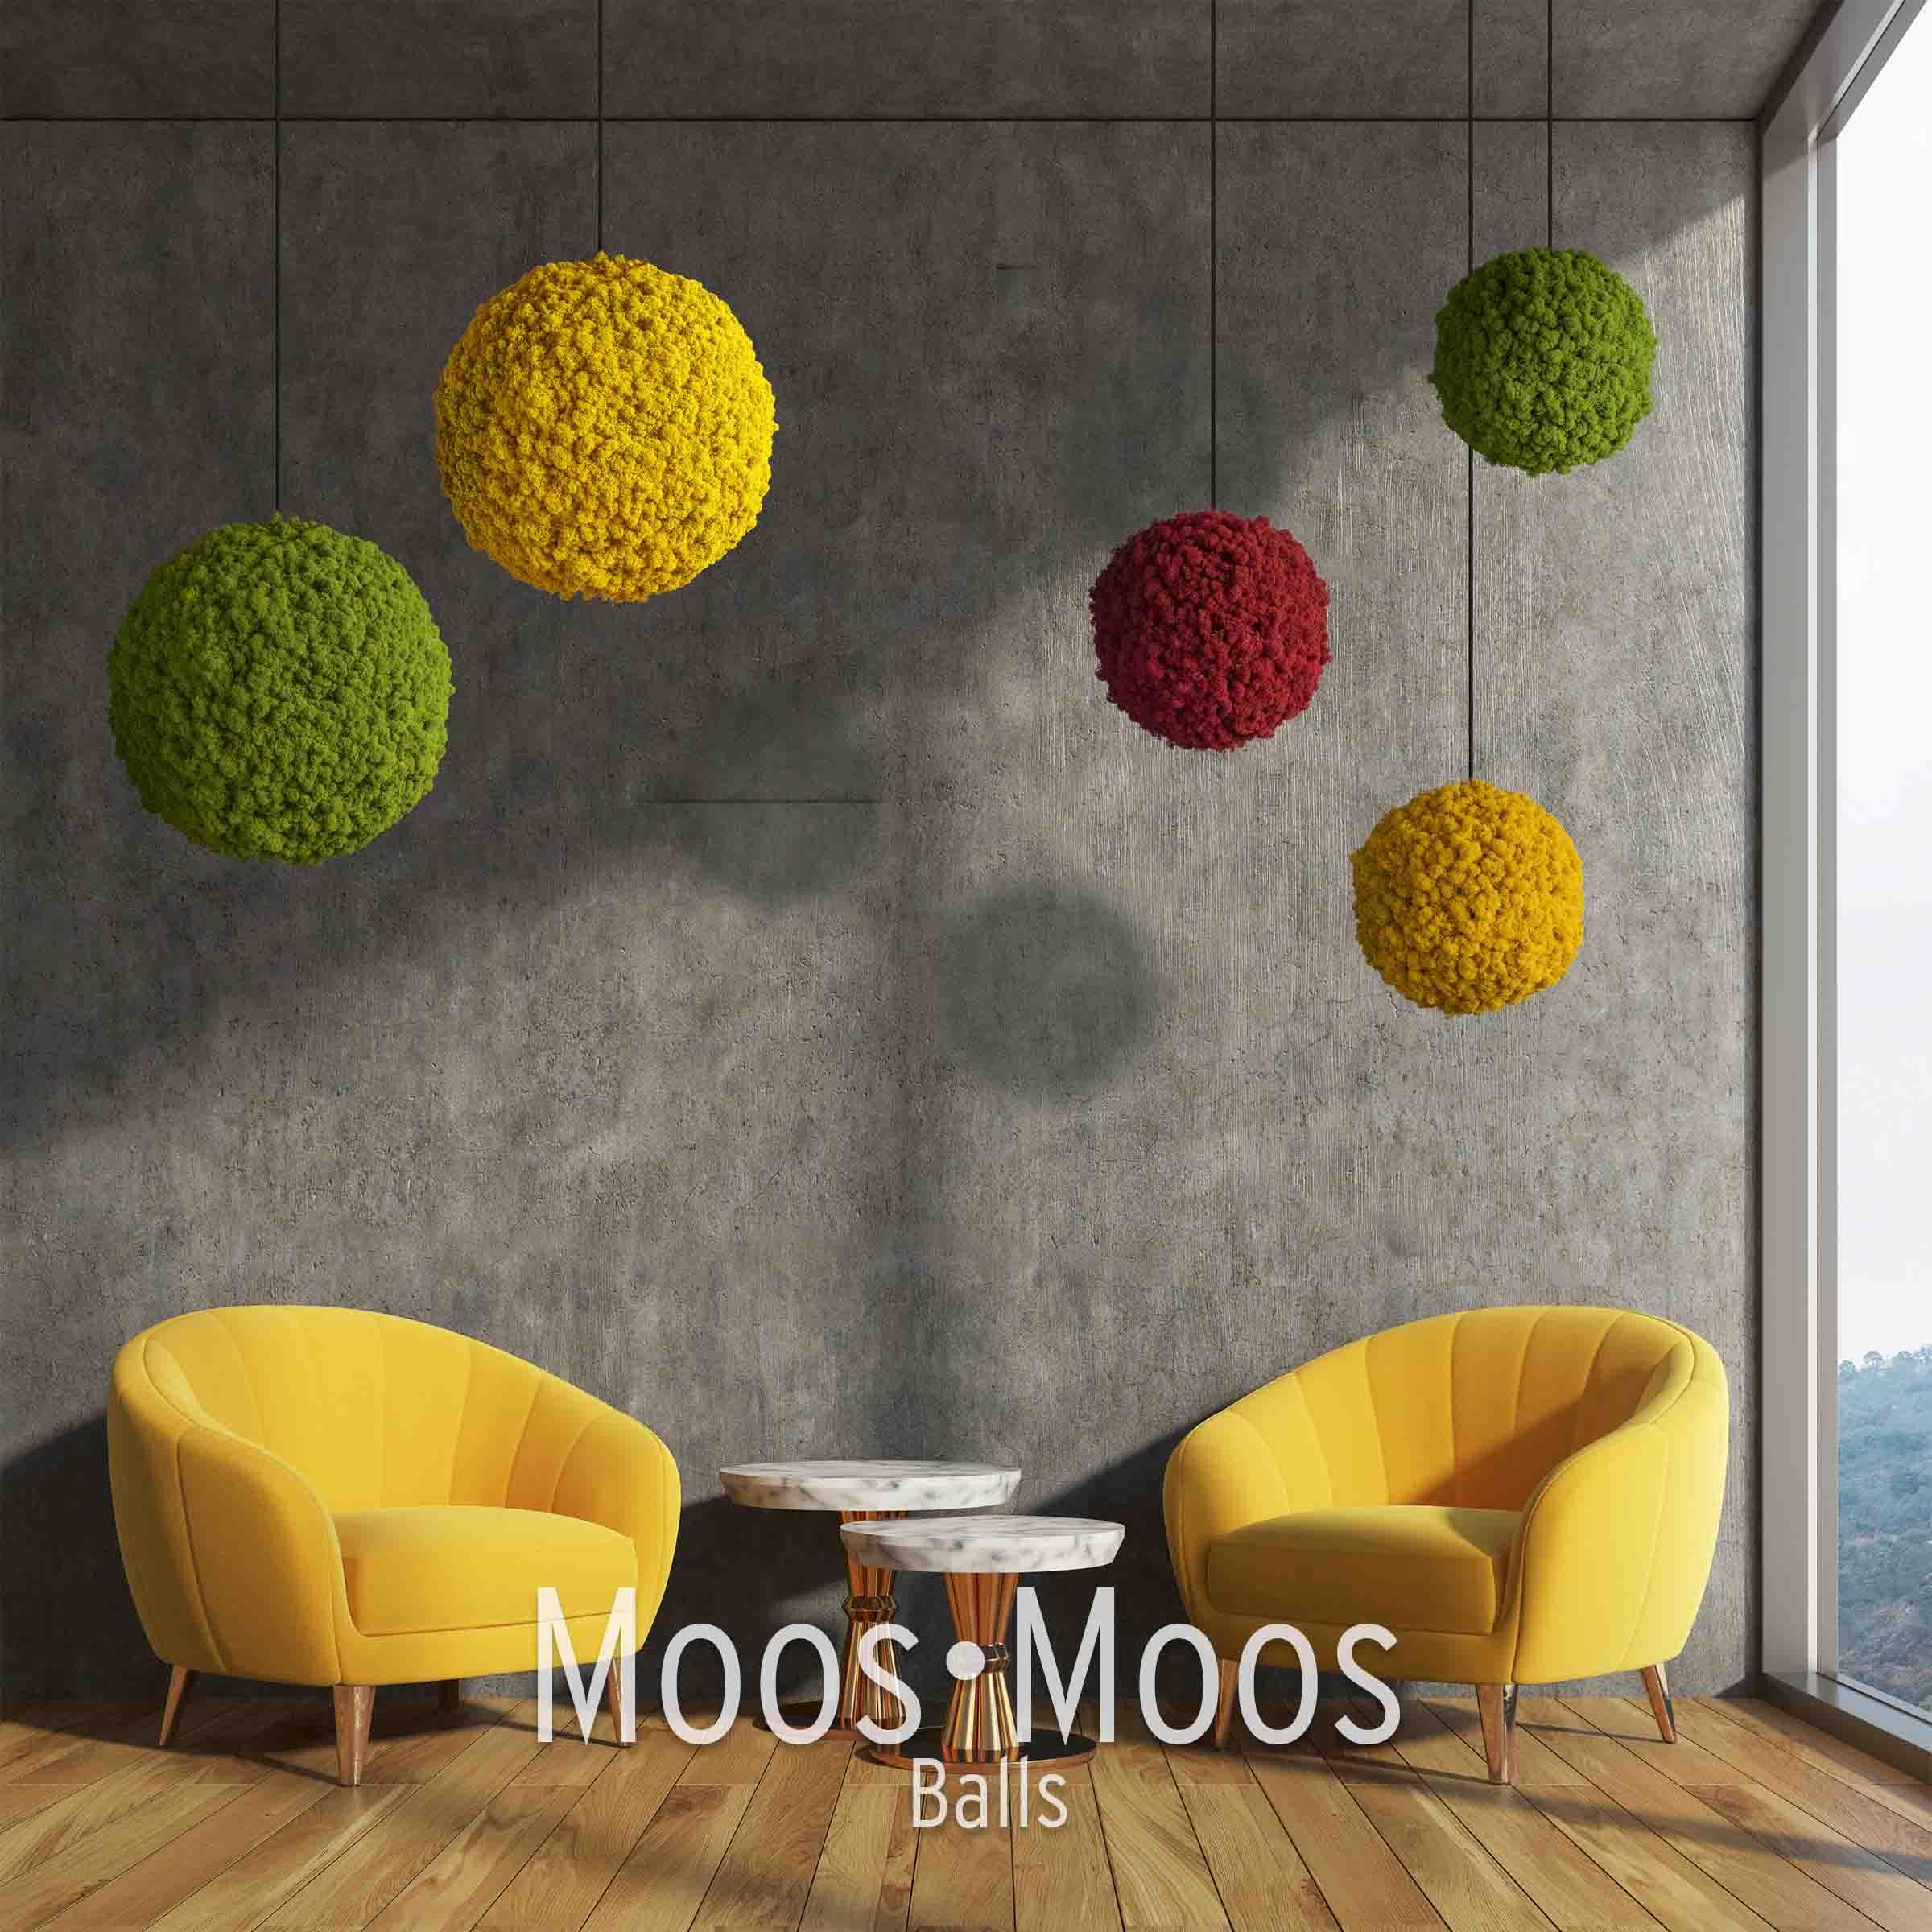 Moos Balls aus Islandmoos